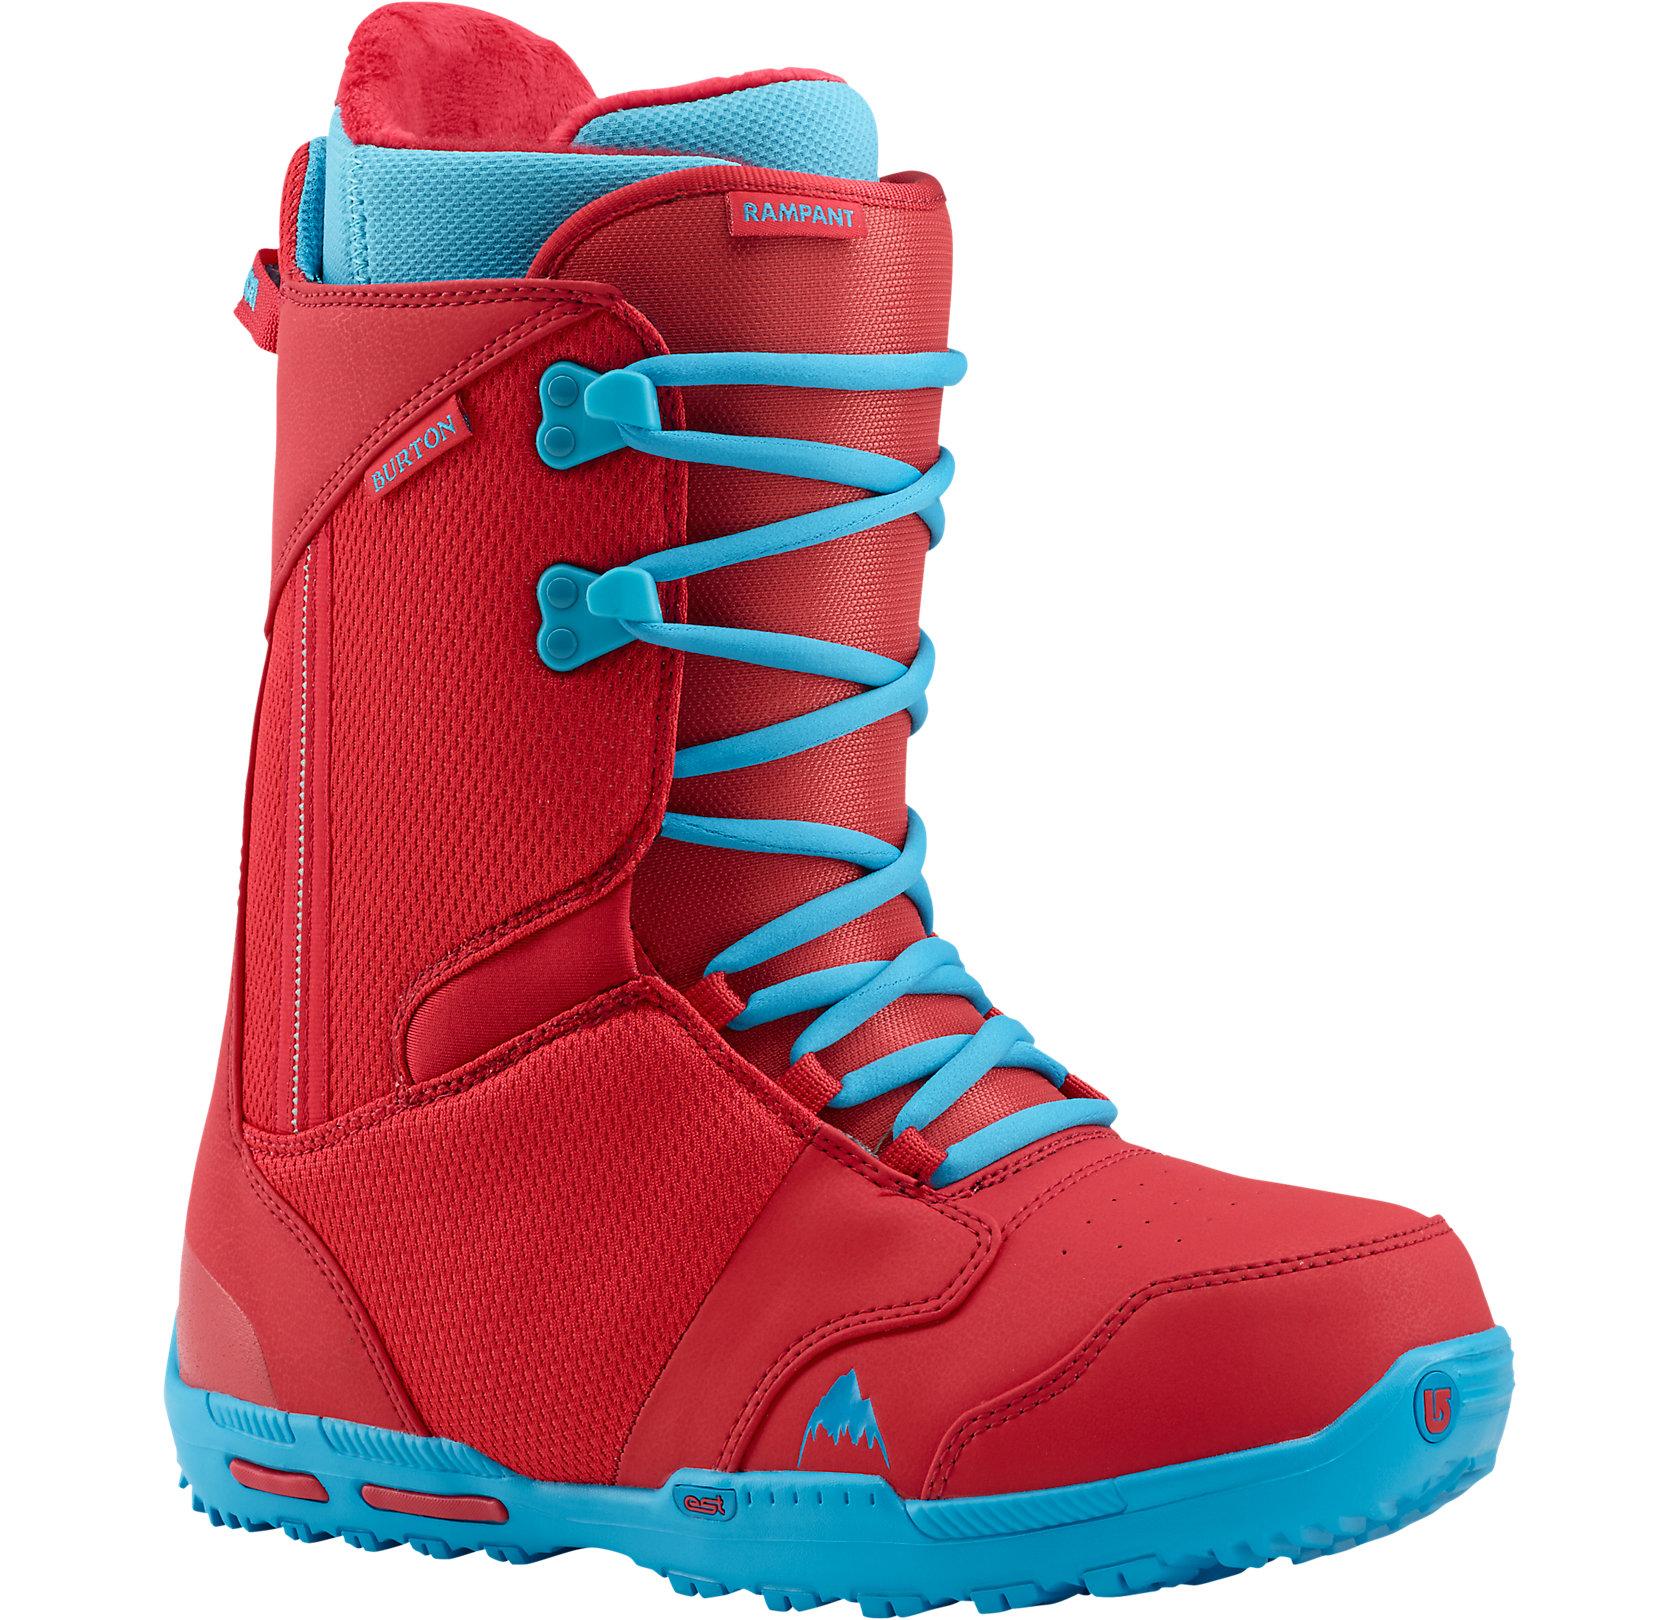 burton pampant snowboard boot